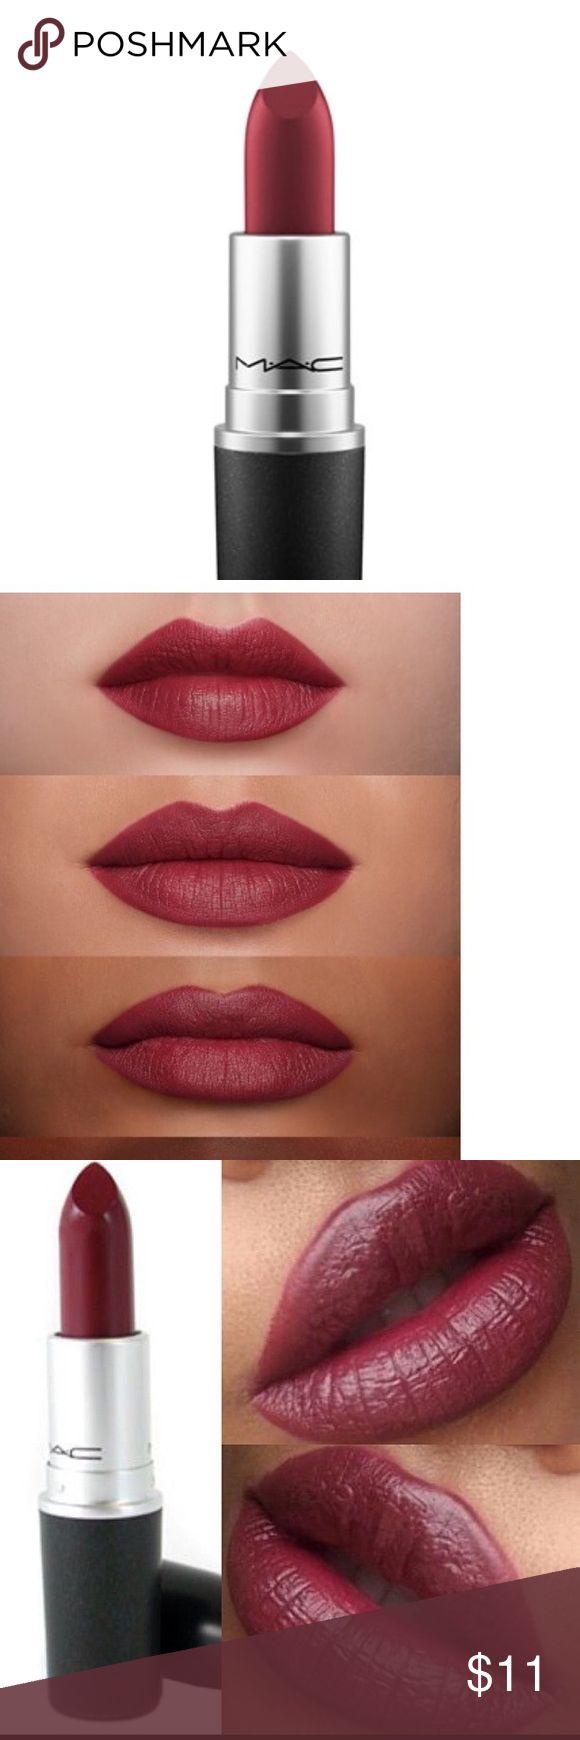 25 best ideas about mac diva lipstick on pinterest mac - Mac diva lipstick price ...